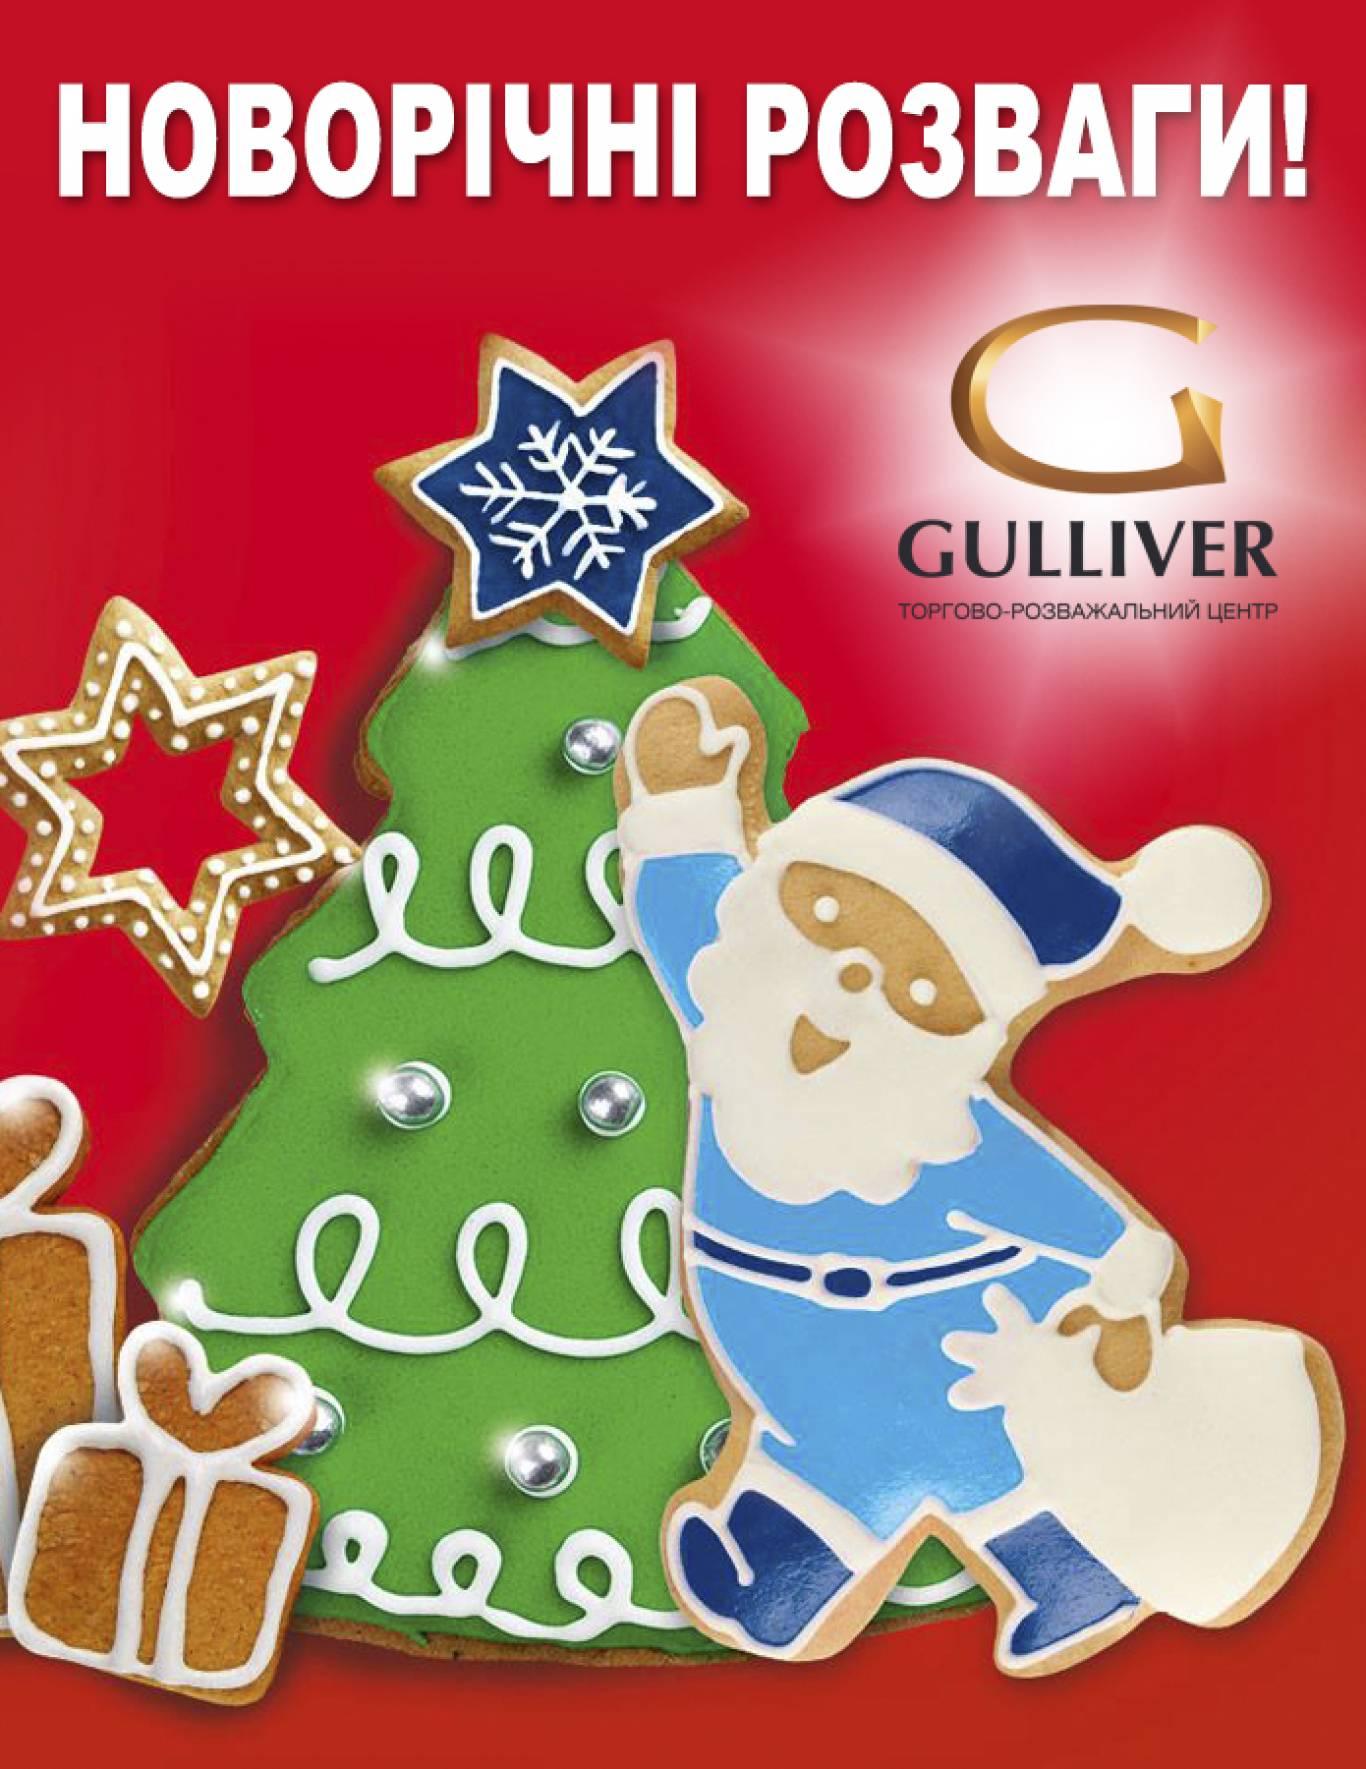 Новорічна казка на день Святого Миколая в ТРЦ Gulliver